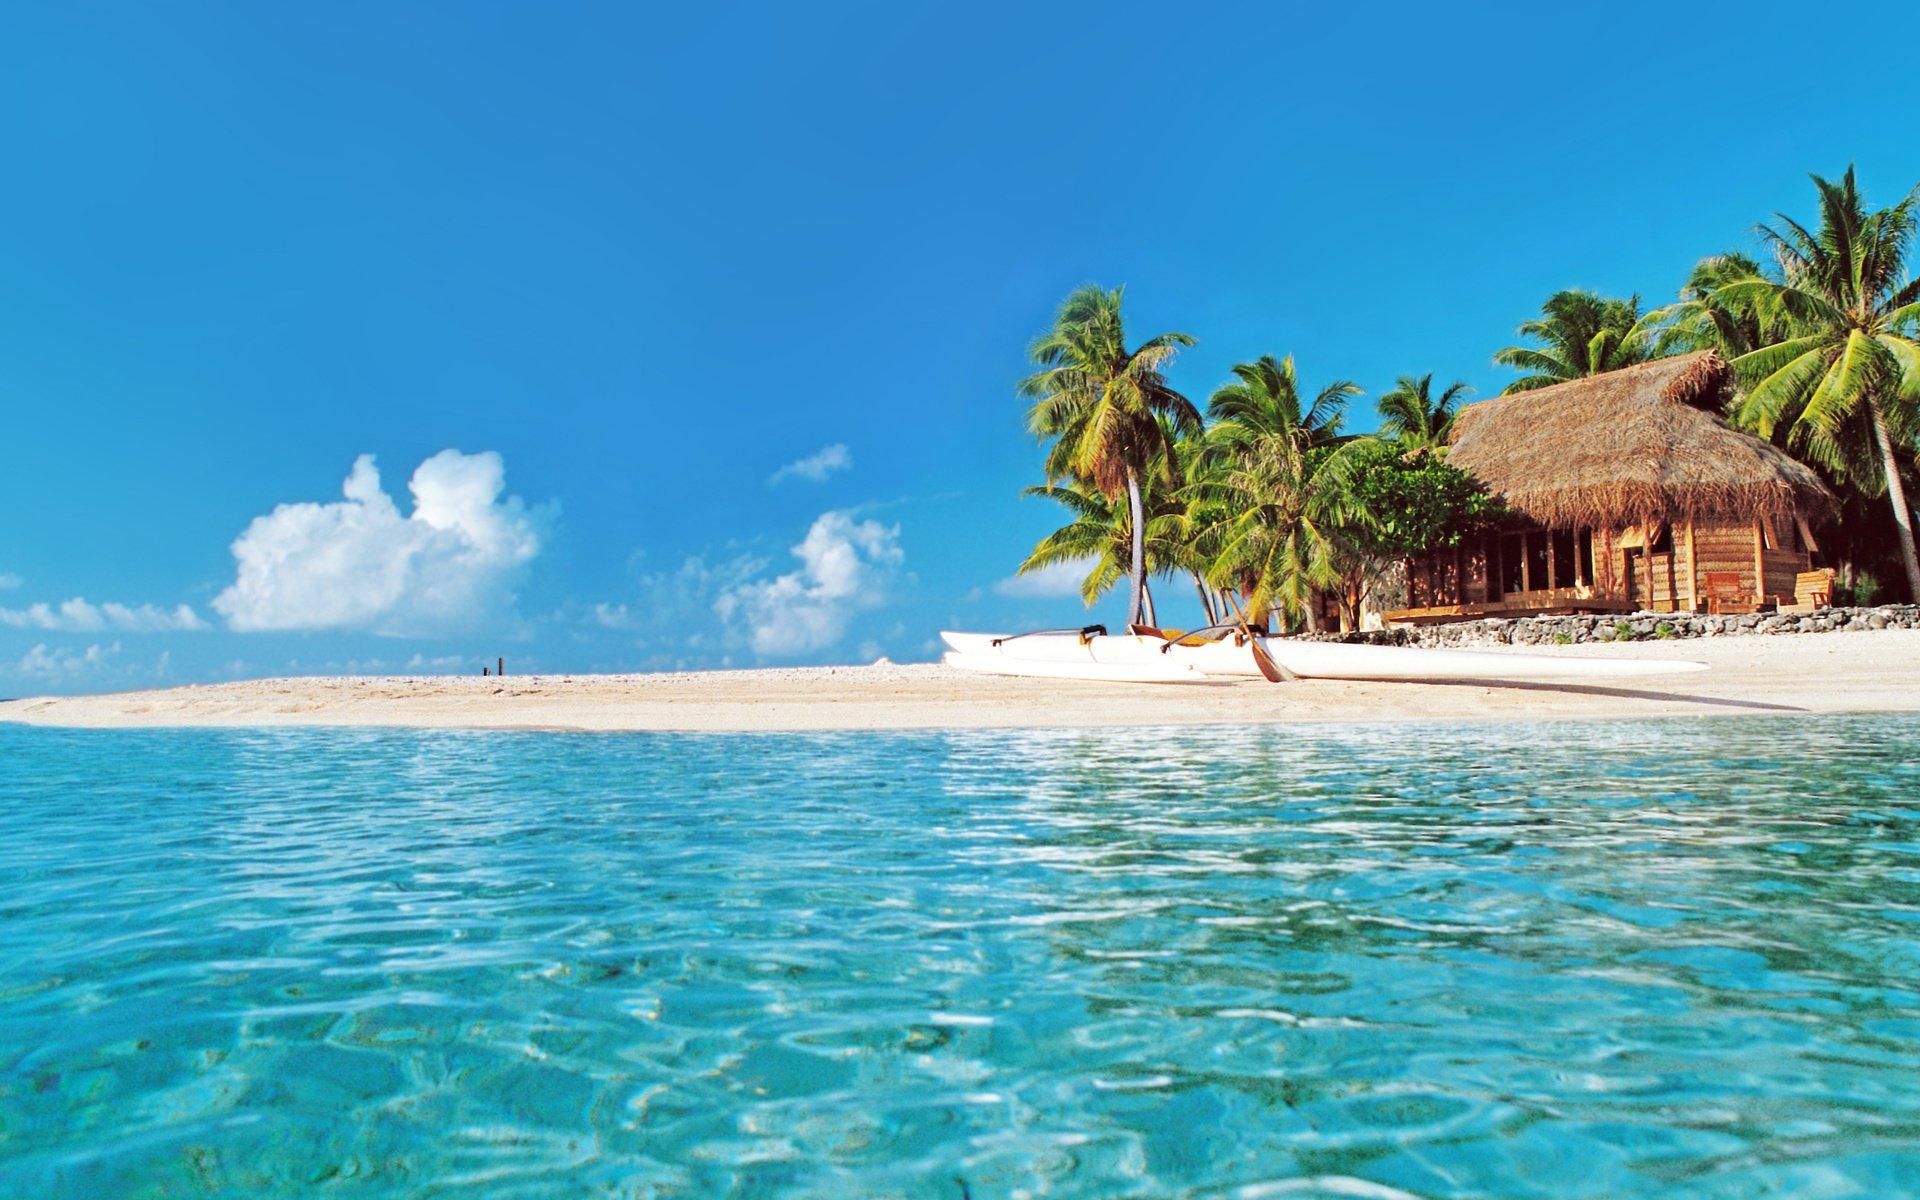 Tropical Paradise Beach Hd Wallpaper For Nexus 7 Screens: Hut On Tropical Beach Full HD Wallpaper And Background